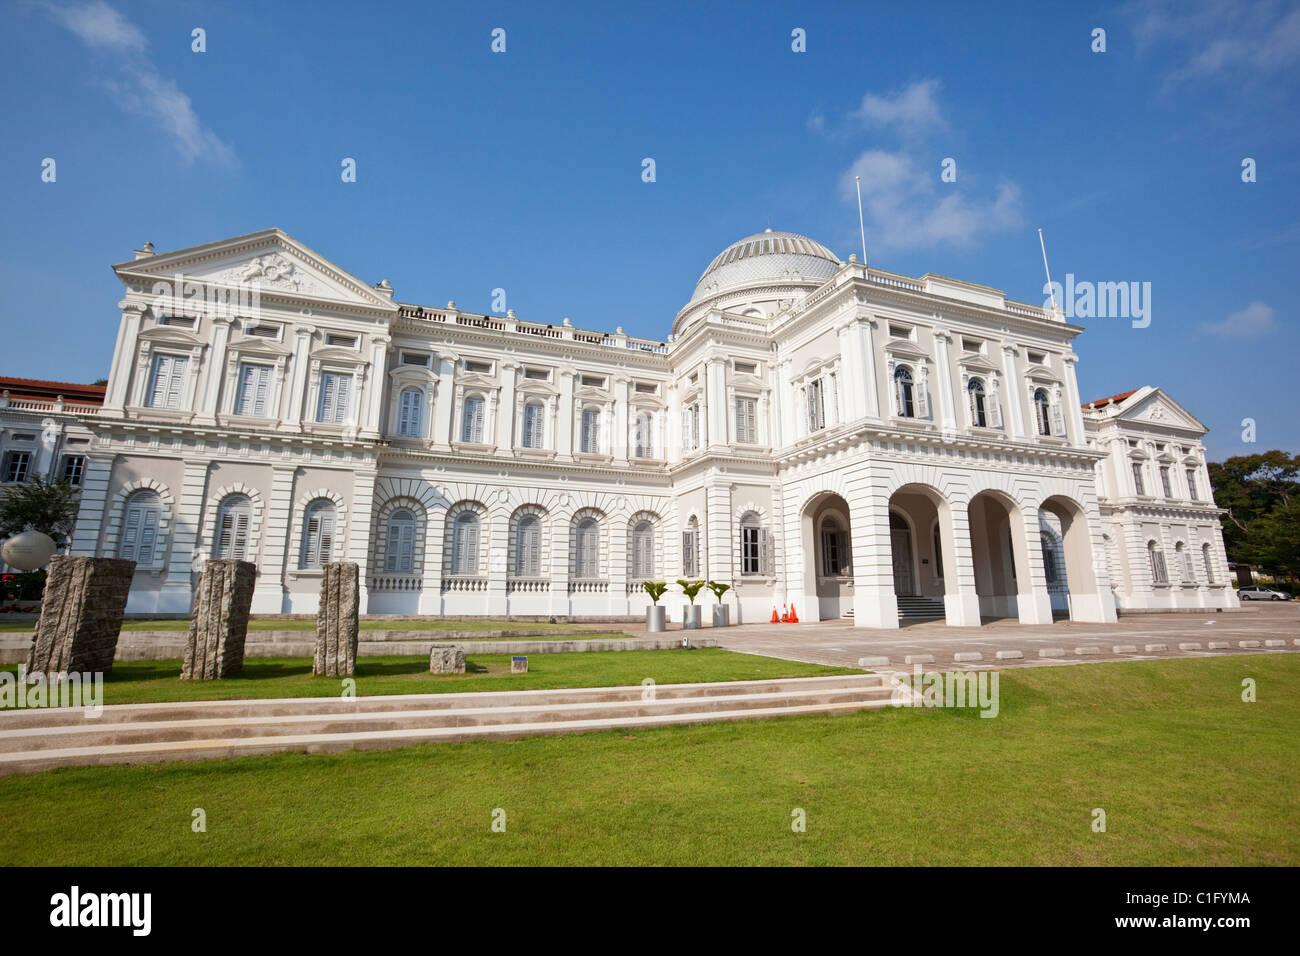 Arquitectura colonial del Museo Nacional de Singapur, Singapur Imagen De Stock